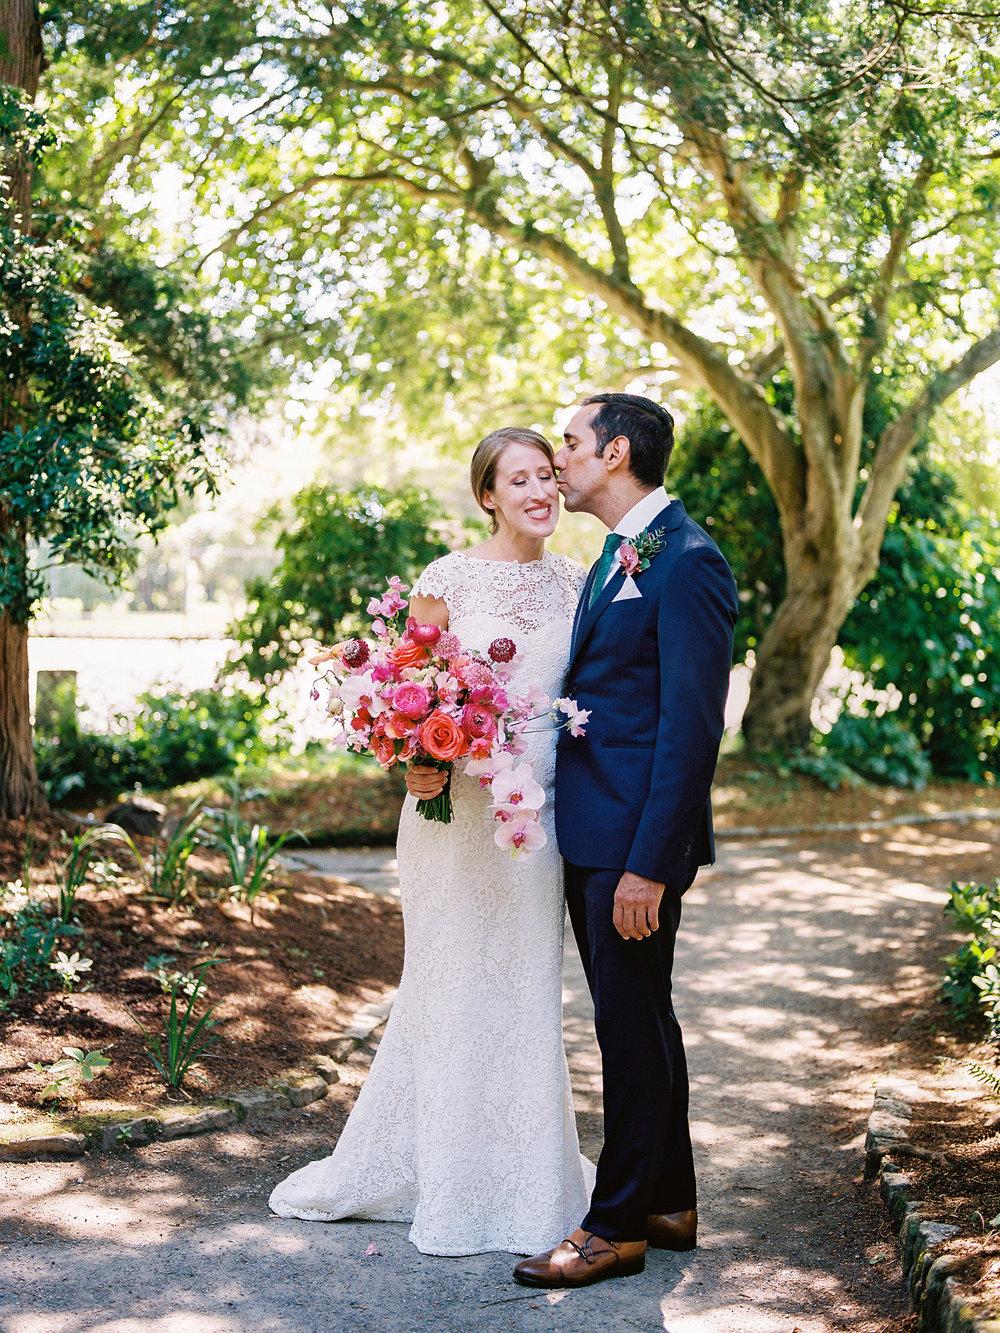 Seattle Parsons Garden Wedding Photography by Alexandra Knight Photography.jpg